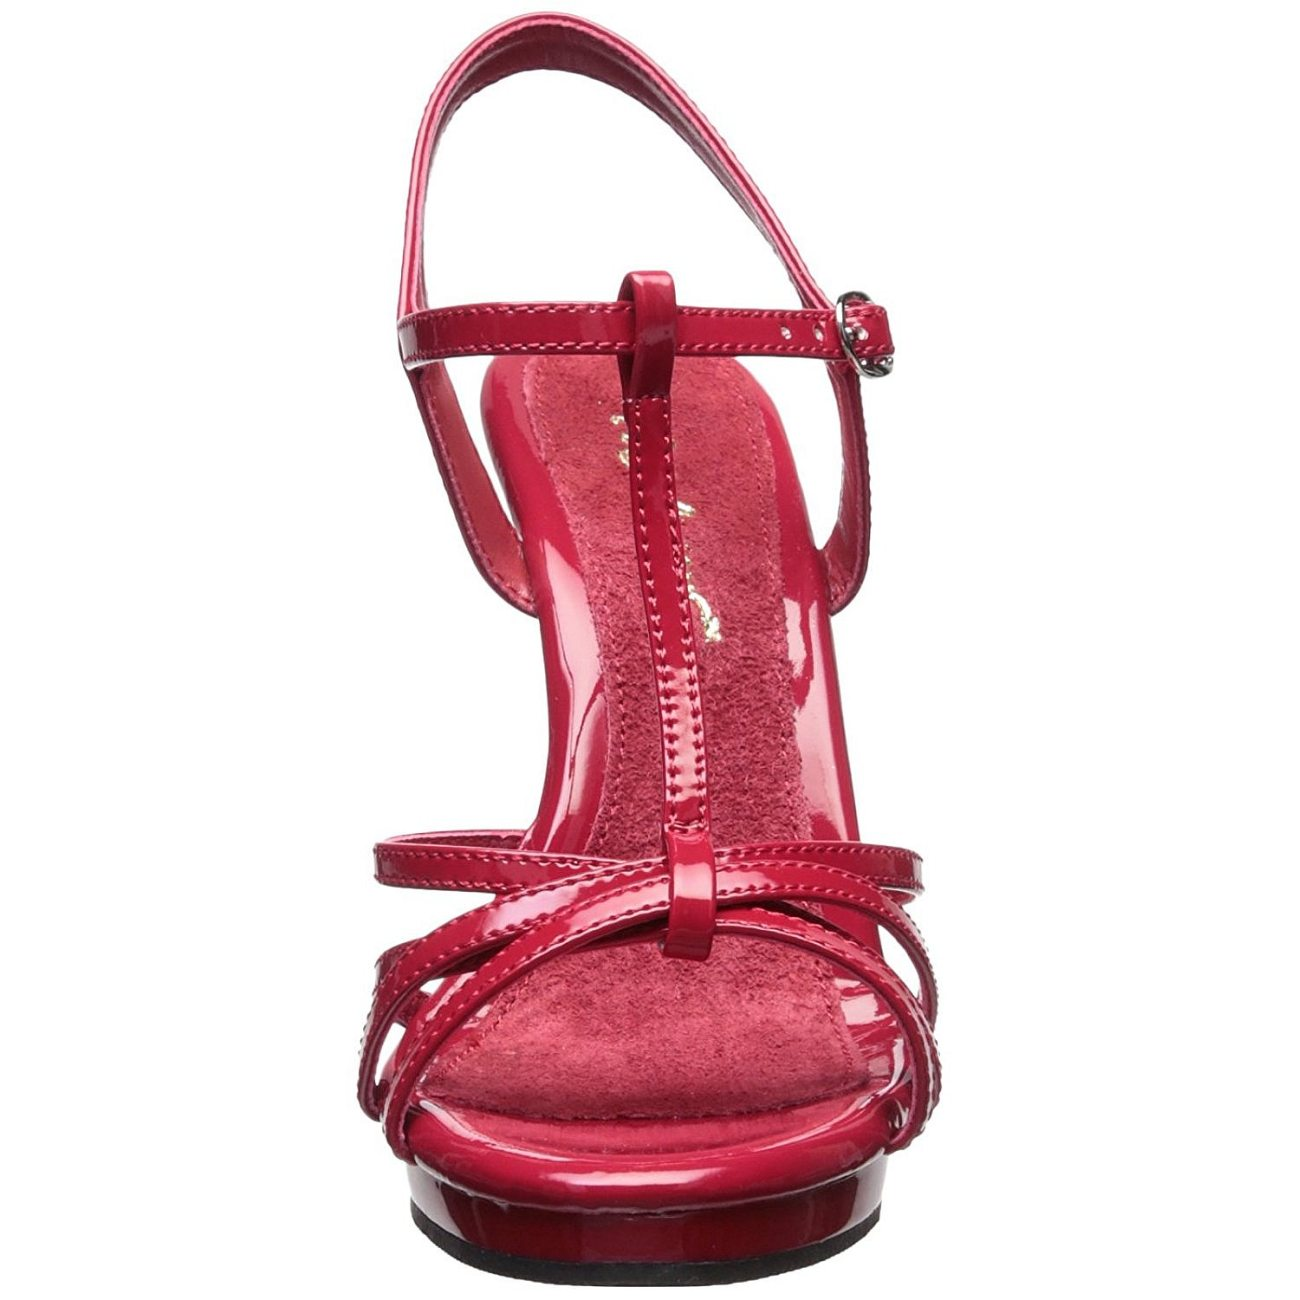 dbd6df2a27 Rouge-Verni-12-cm-FLAIR-420-Sandales-Femme-a-Talon-9950_2.jpg